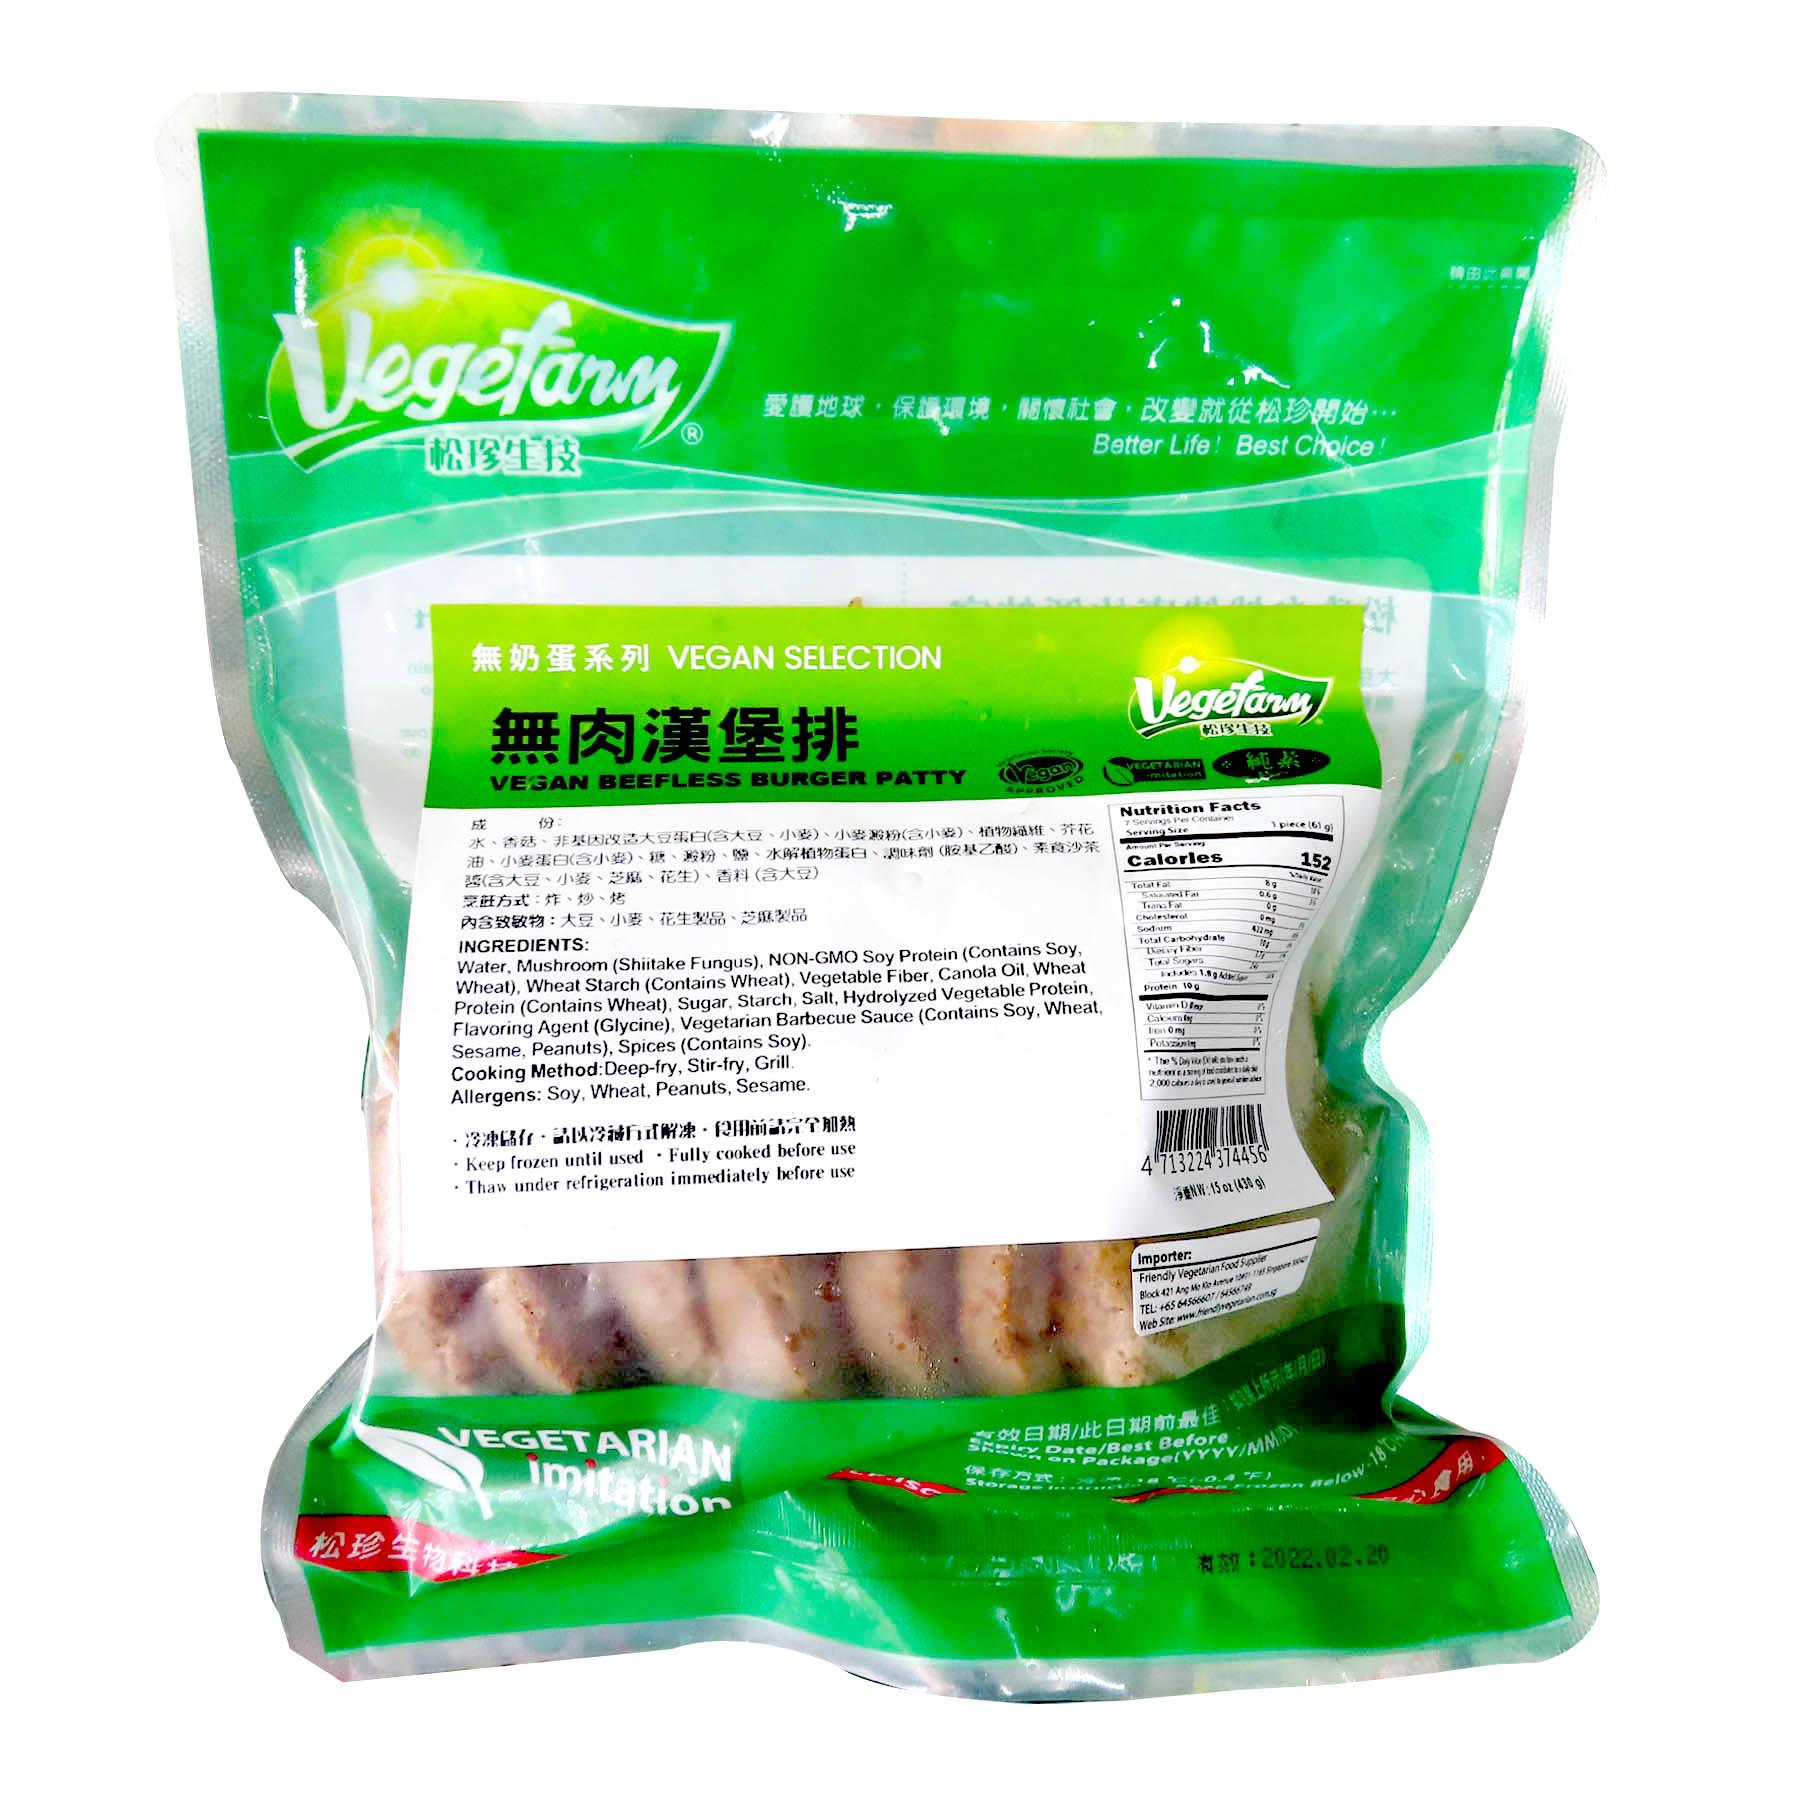 Image Vegefarm Vegan Beefless Burger Patty 松珍 - 无肉汉堡排 (纯素)430grams